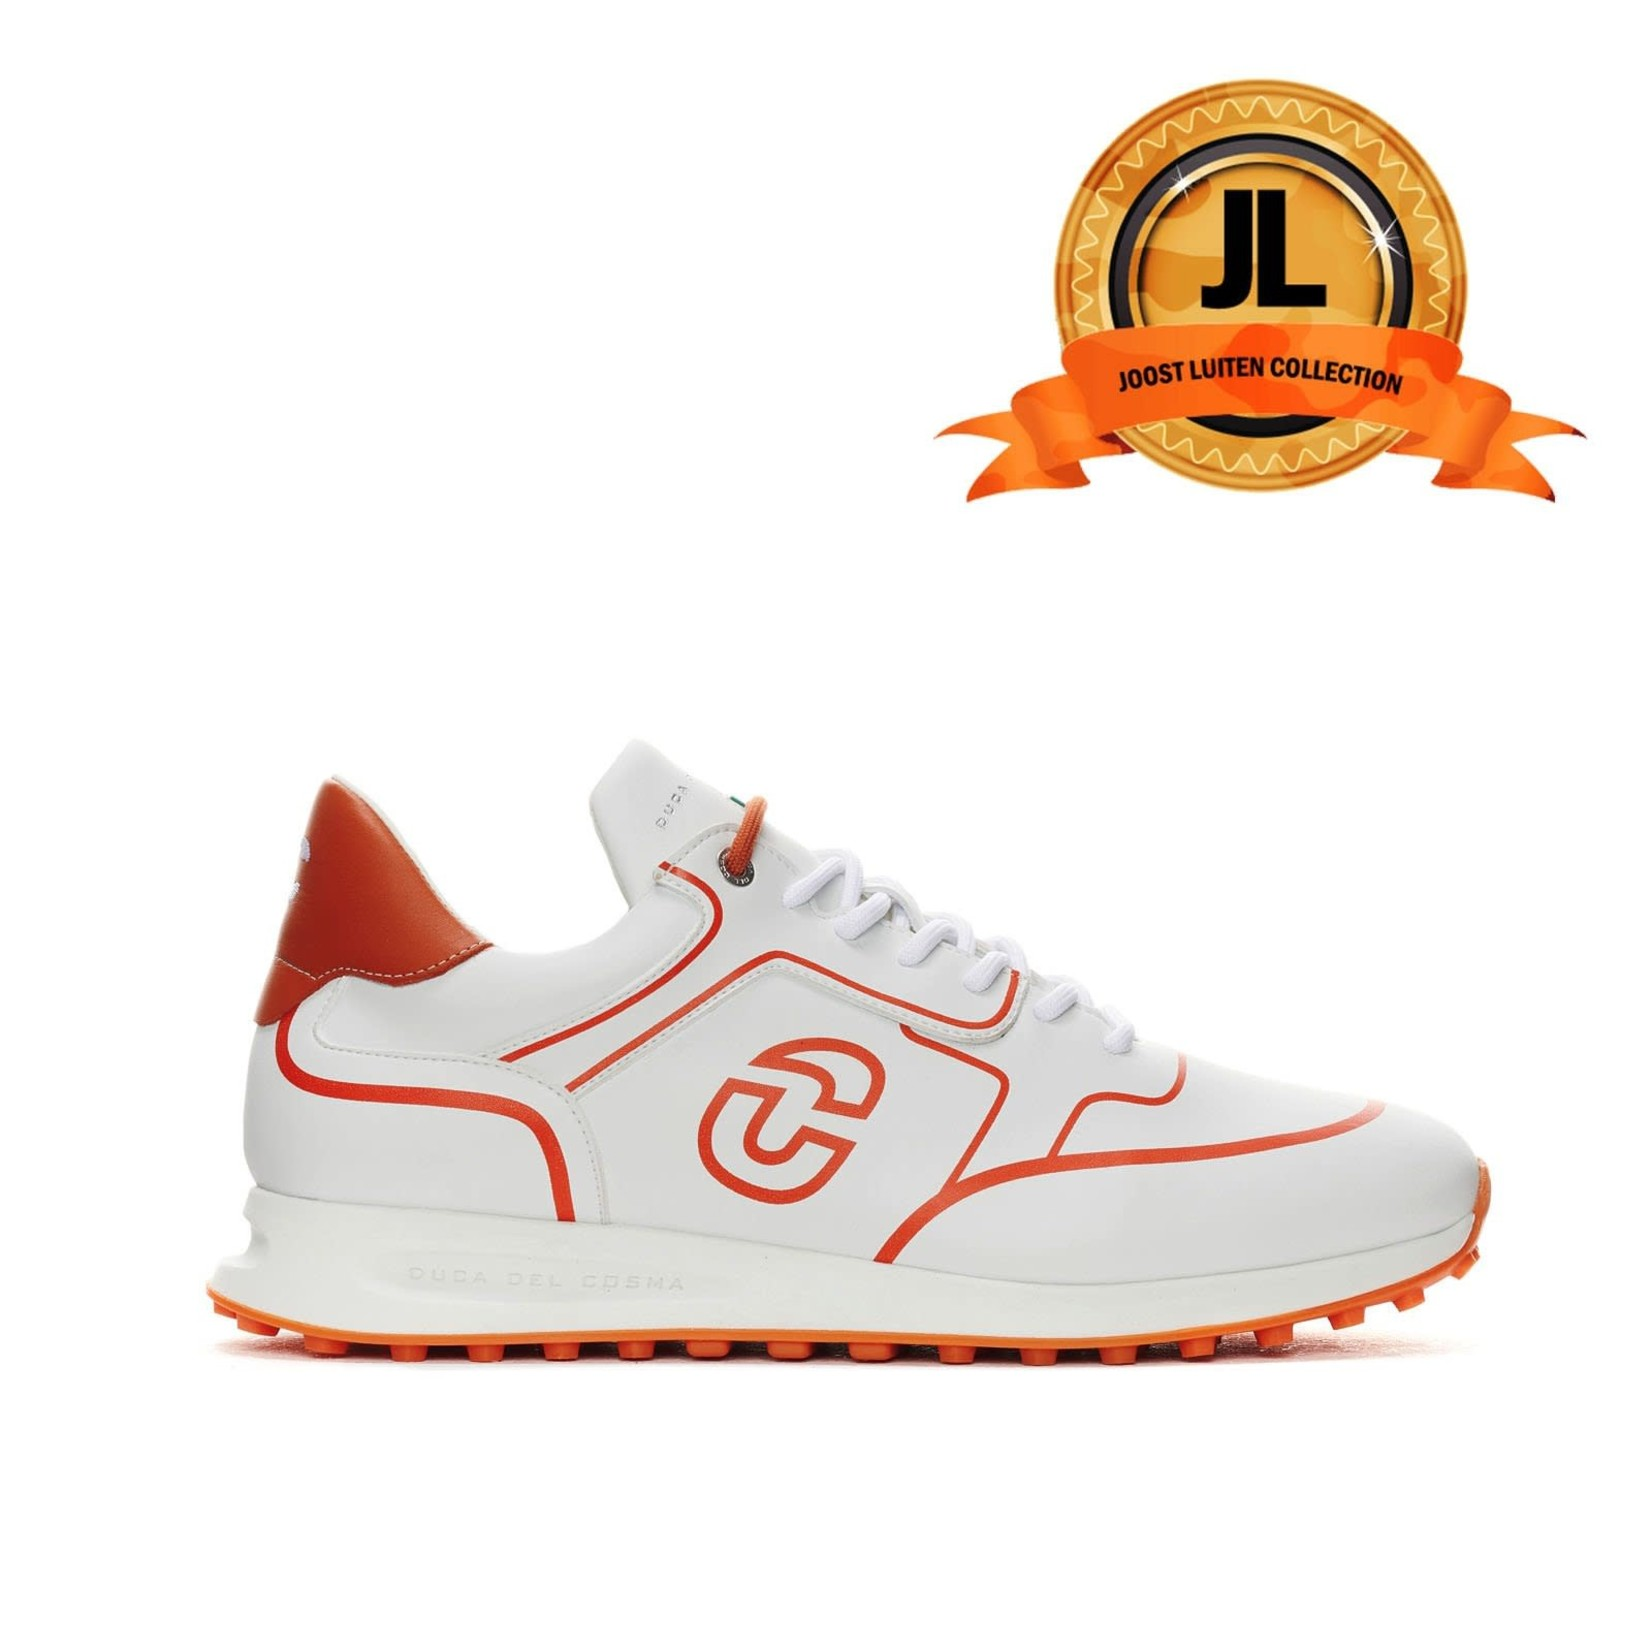 Duca del Cosma Duca del Cosma JL3 Joost Luiten 3 Flyer - White/Orange